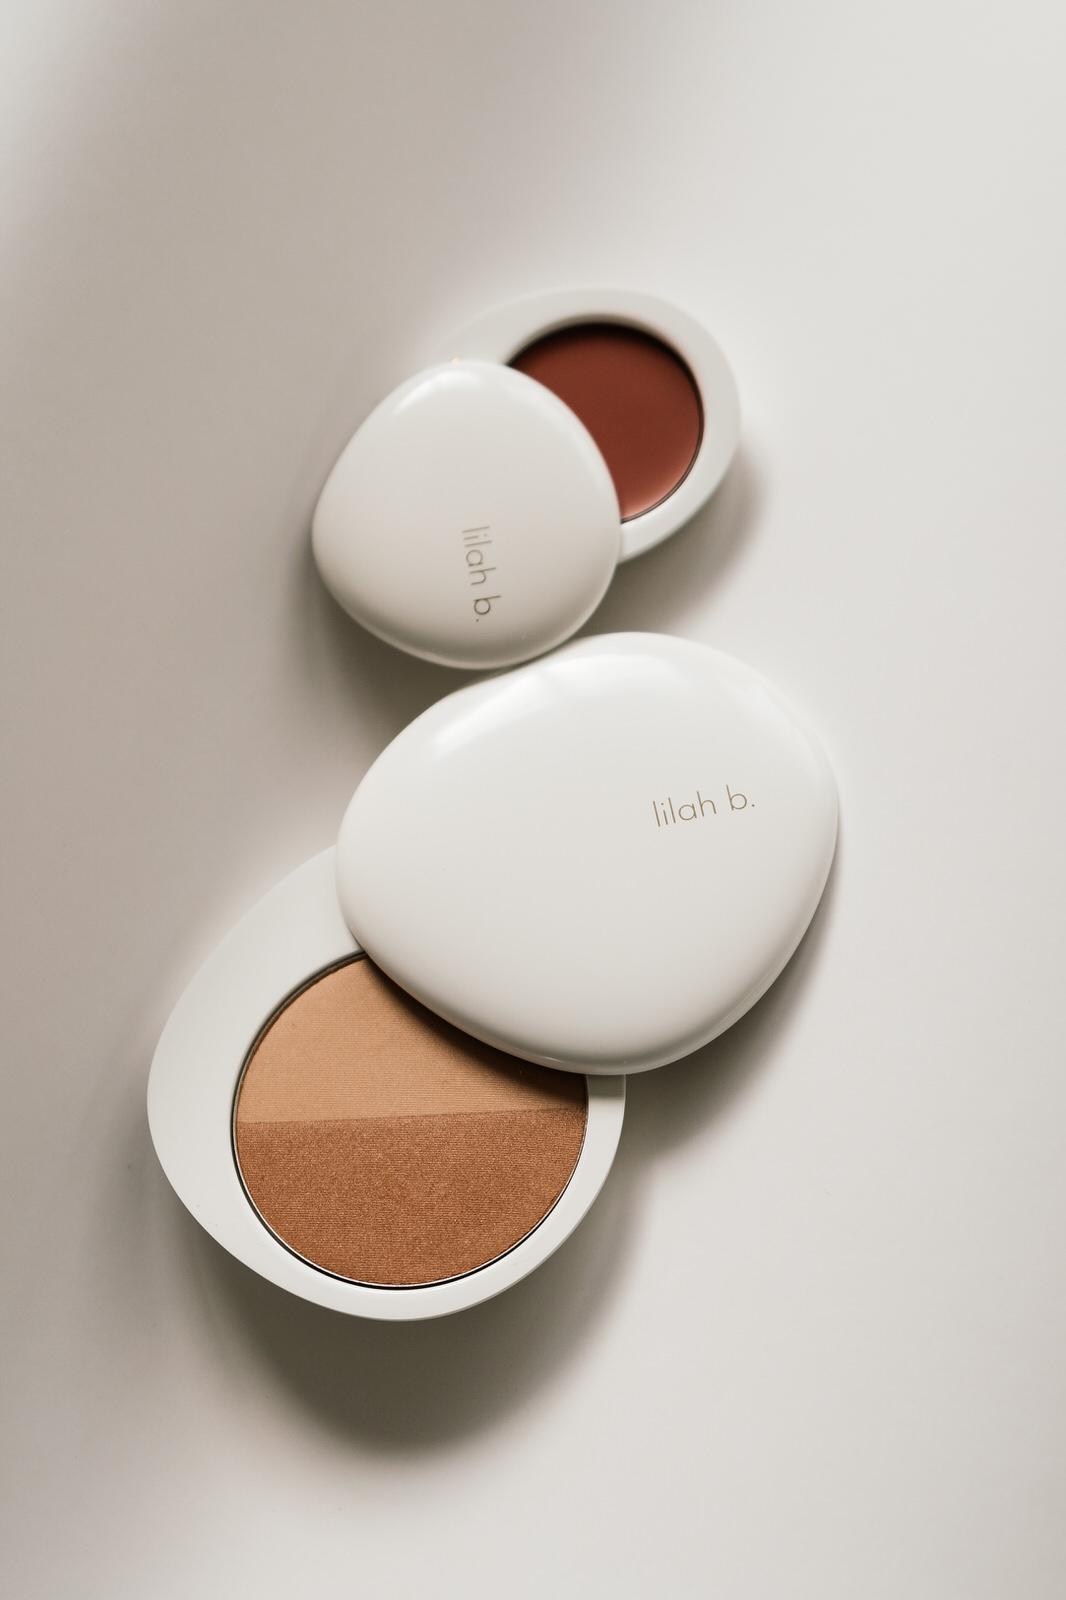 Lilah B = Cruelty free makeup brand NZ